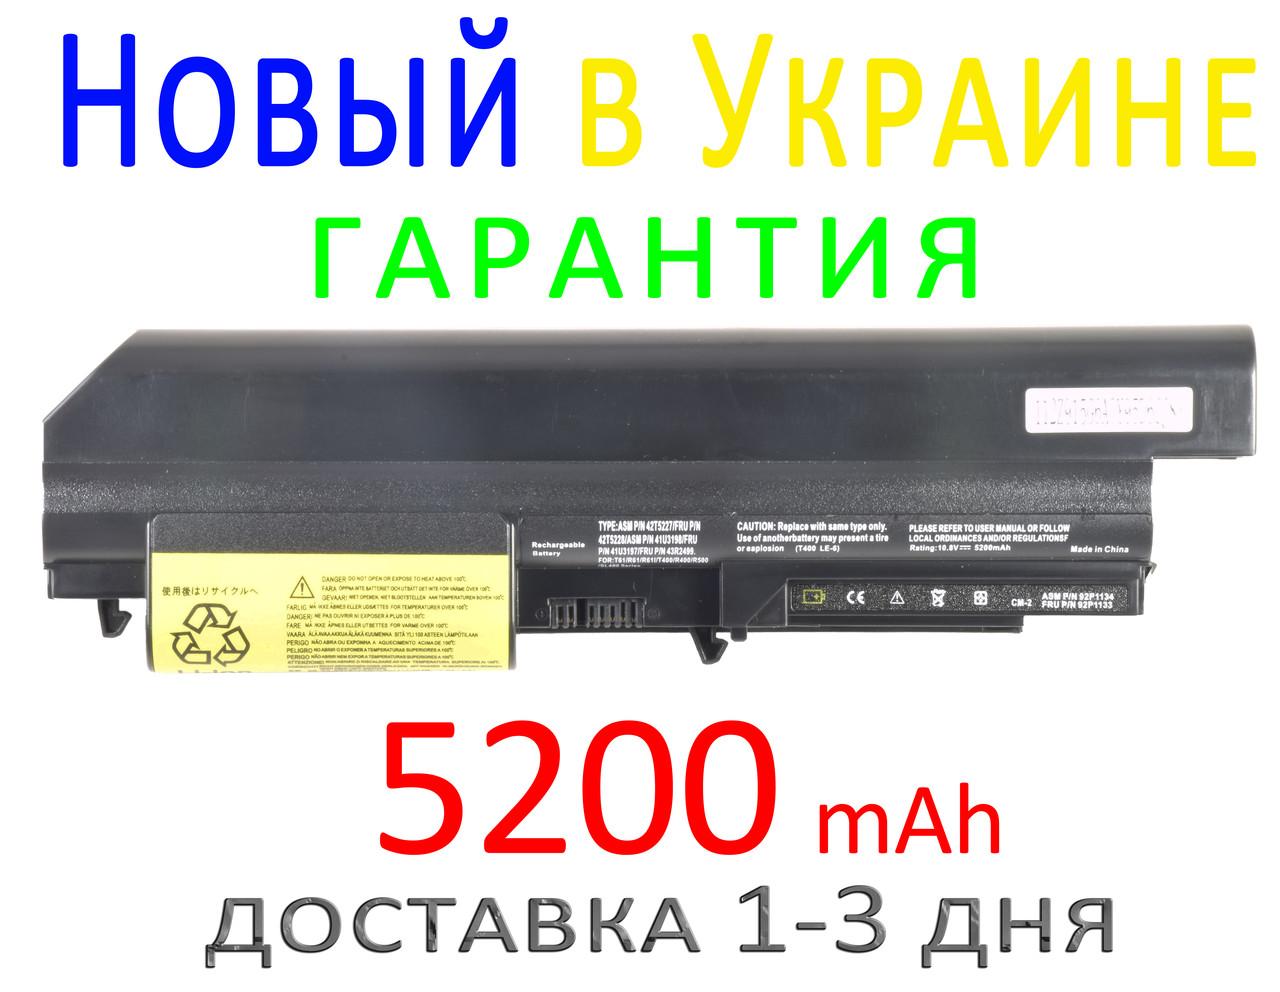 Аккумулятор батареяLENOVO ThinkPad R400 R61 7732 7742 T400 T61 1959 7665